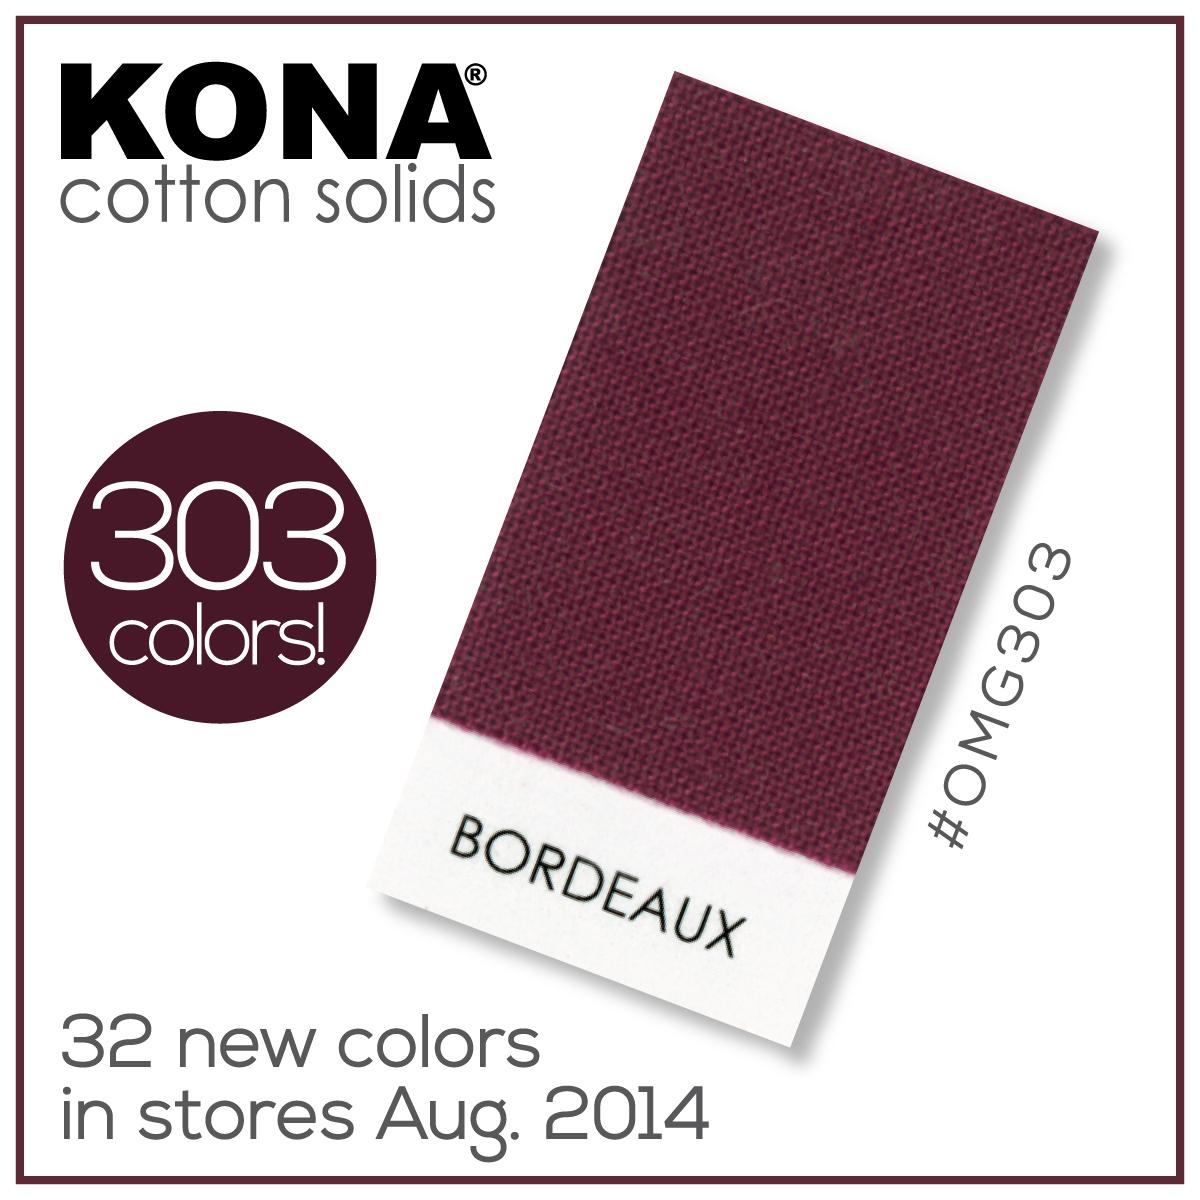 Kona-Bordeaux.jpg